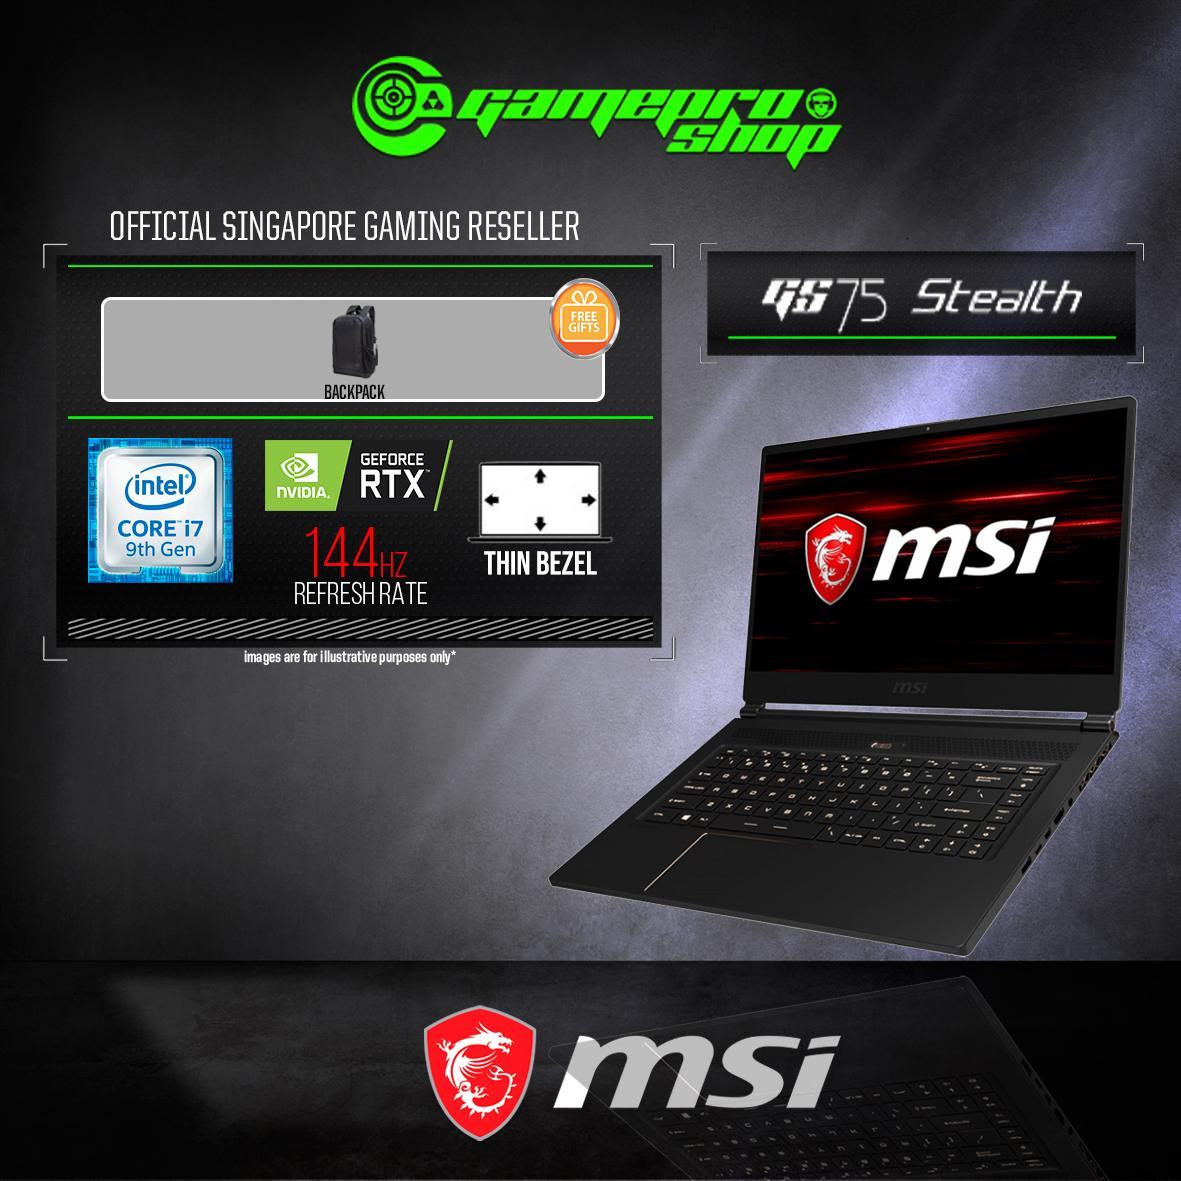 9th Gen MSI GS75 RTX2060 STEALTH 9SE - 490SG (i7-9750H / 16GB / 1TB SSD / WIN 10) 17.3 FHD 144Hz GAMING LAPTOP *COMEX PROMO*